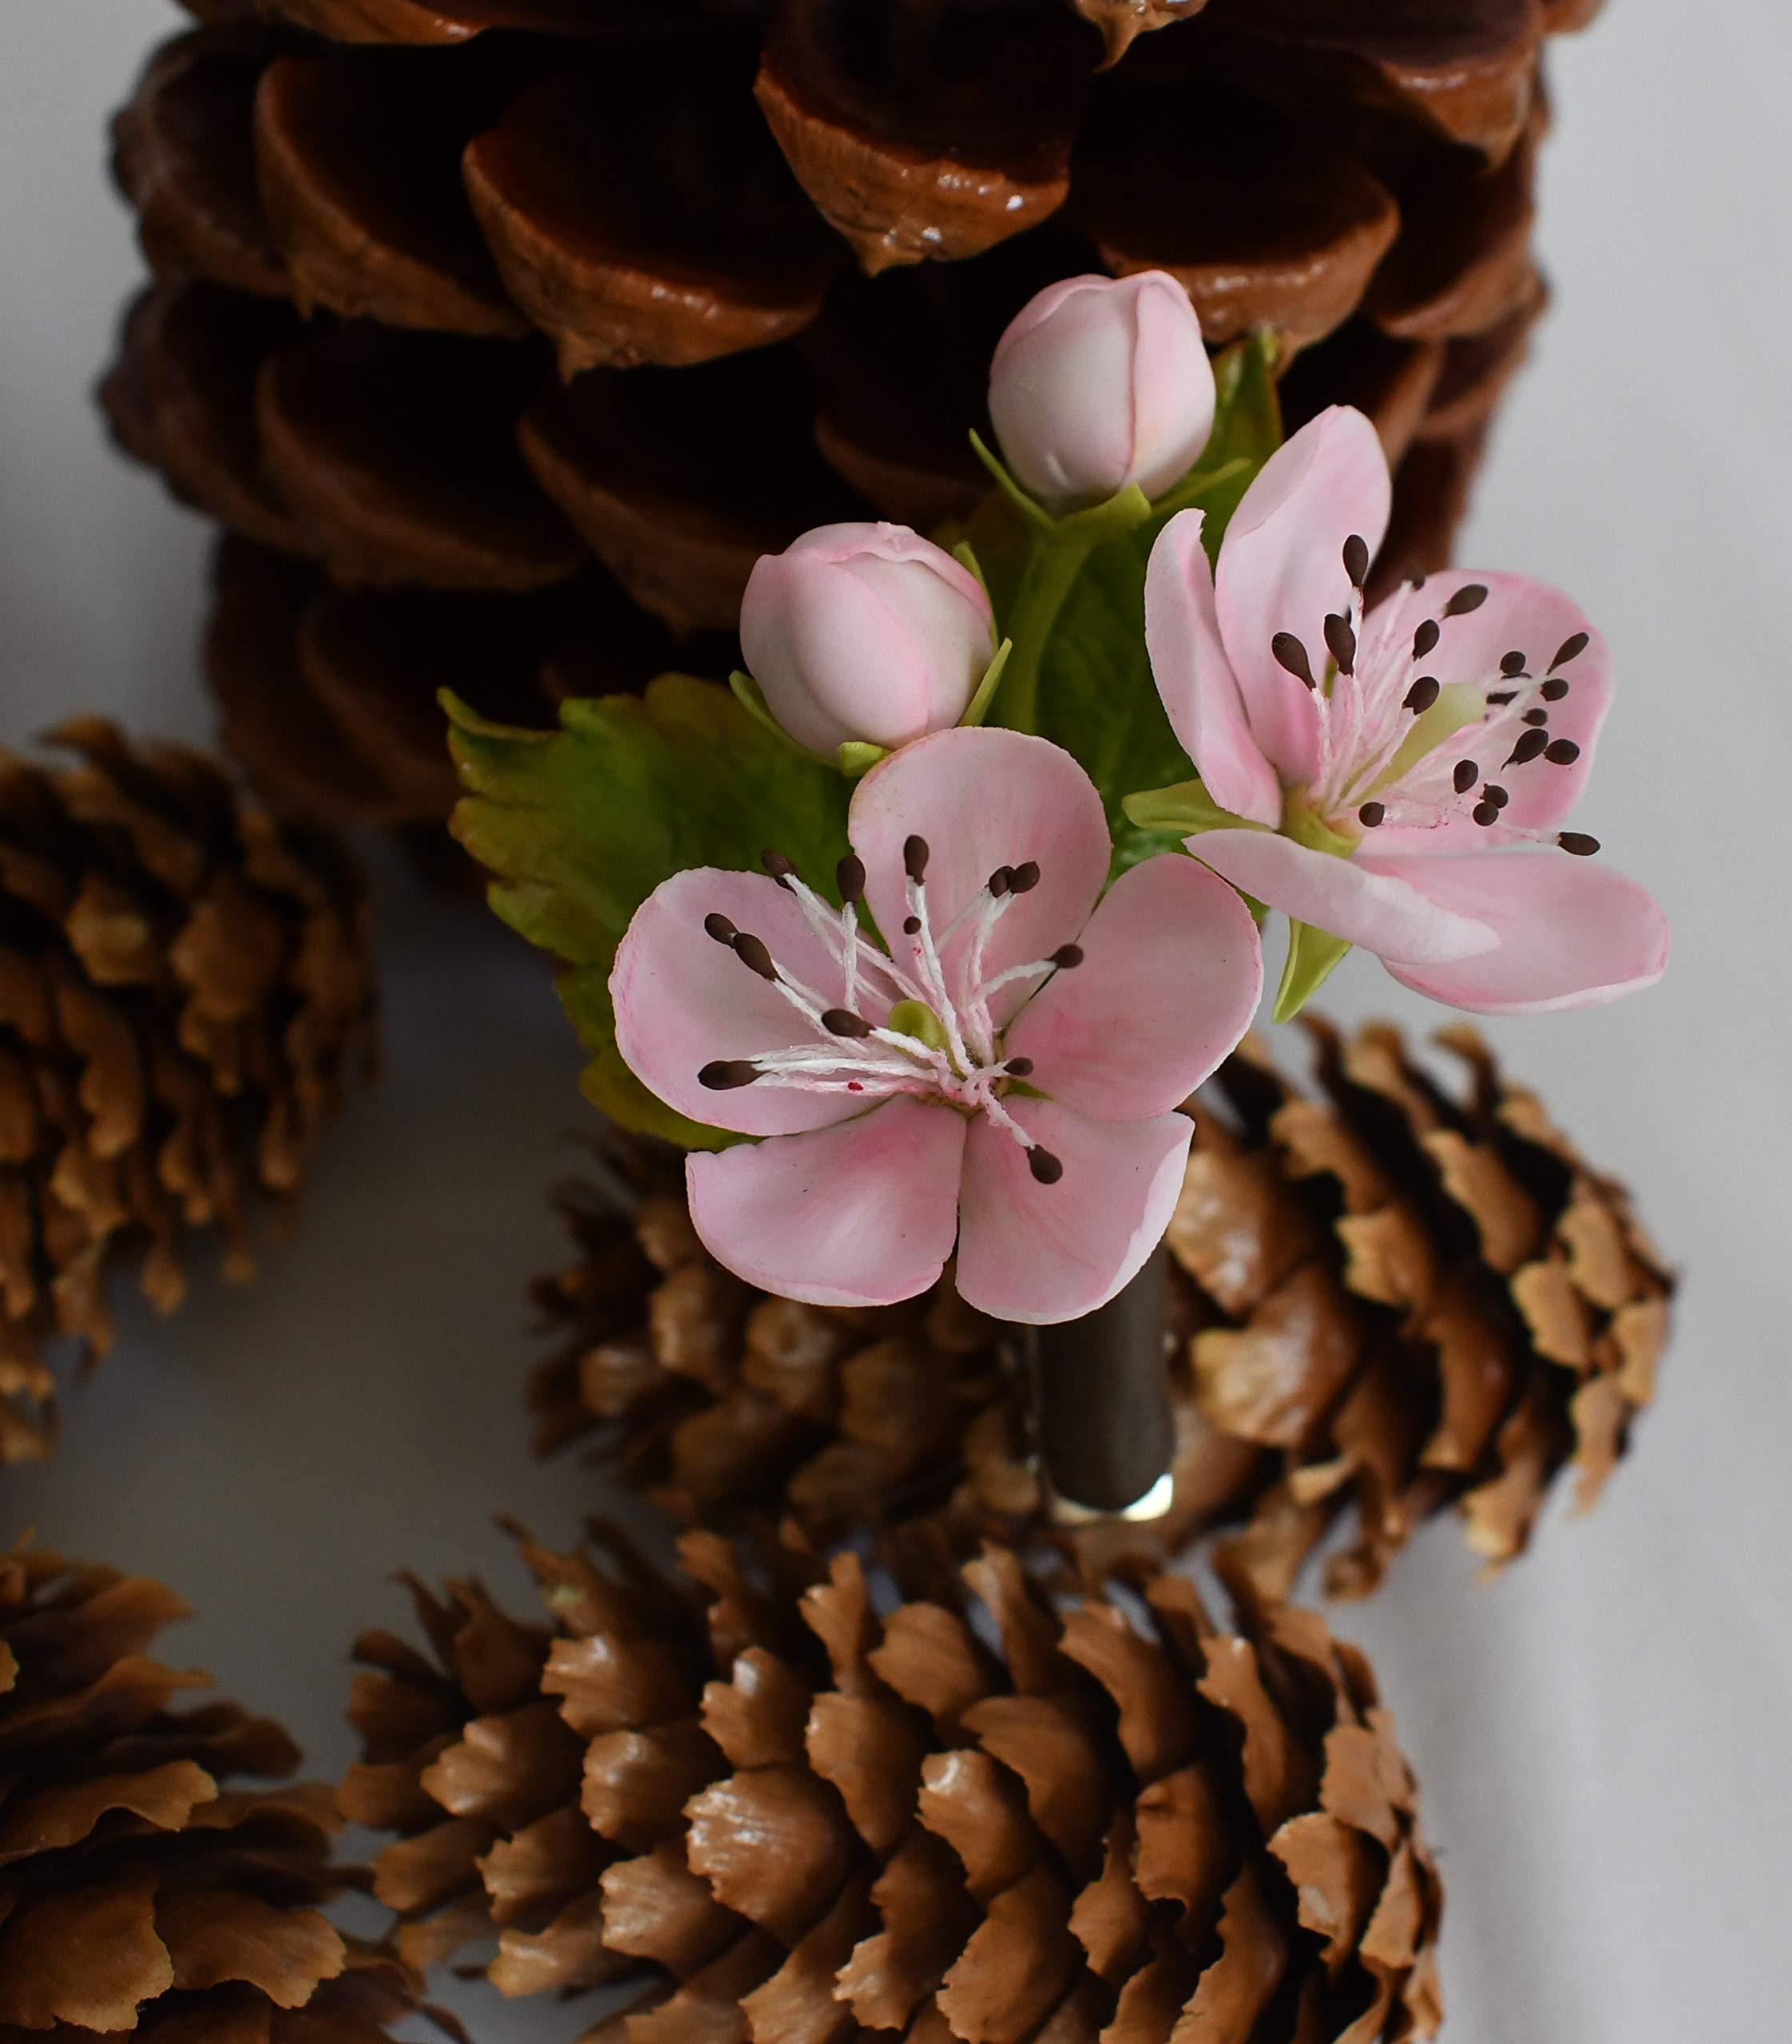 Handmade Sakura Hair Pin | Air Dry Clay | Size 5 cm X 6 cm | 0.2 oz